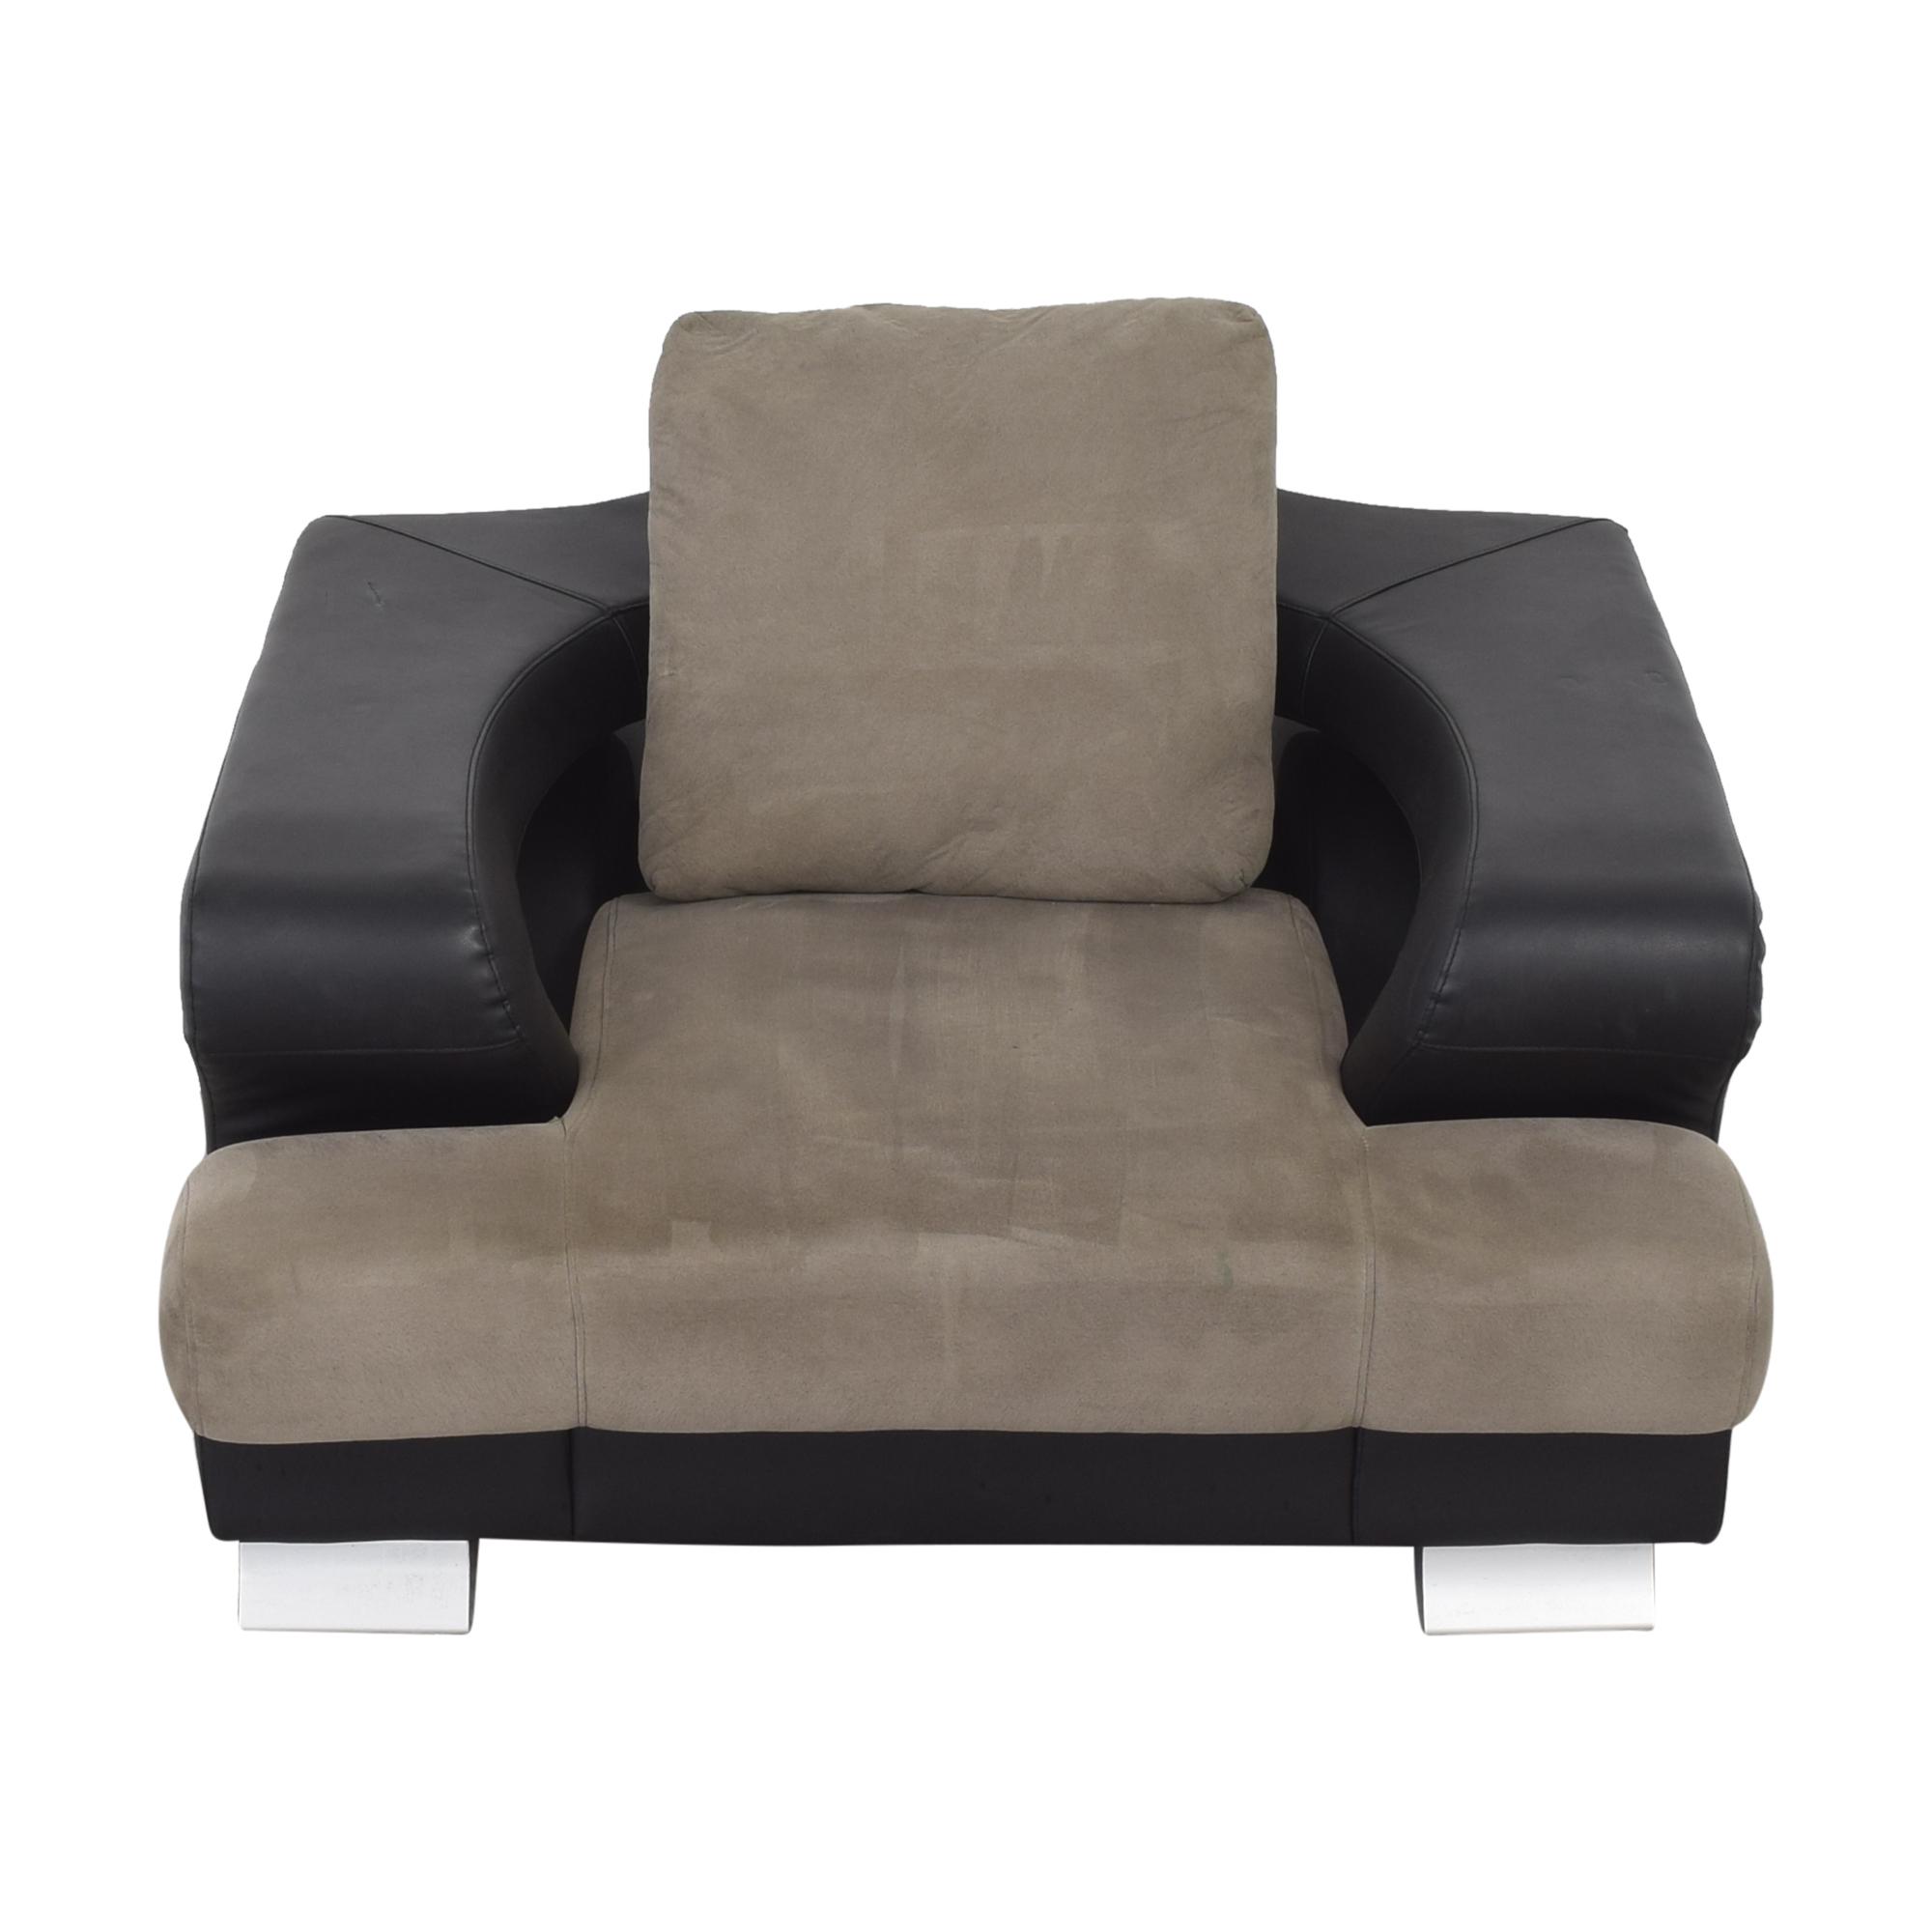 Acme Acme Modern Style Lounge Chair ma